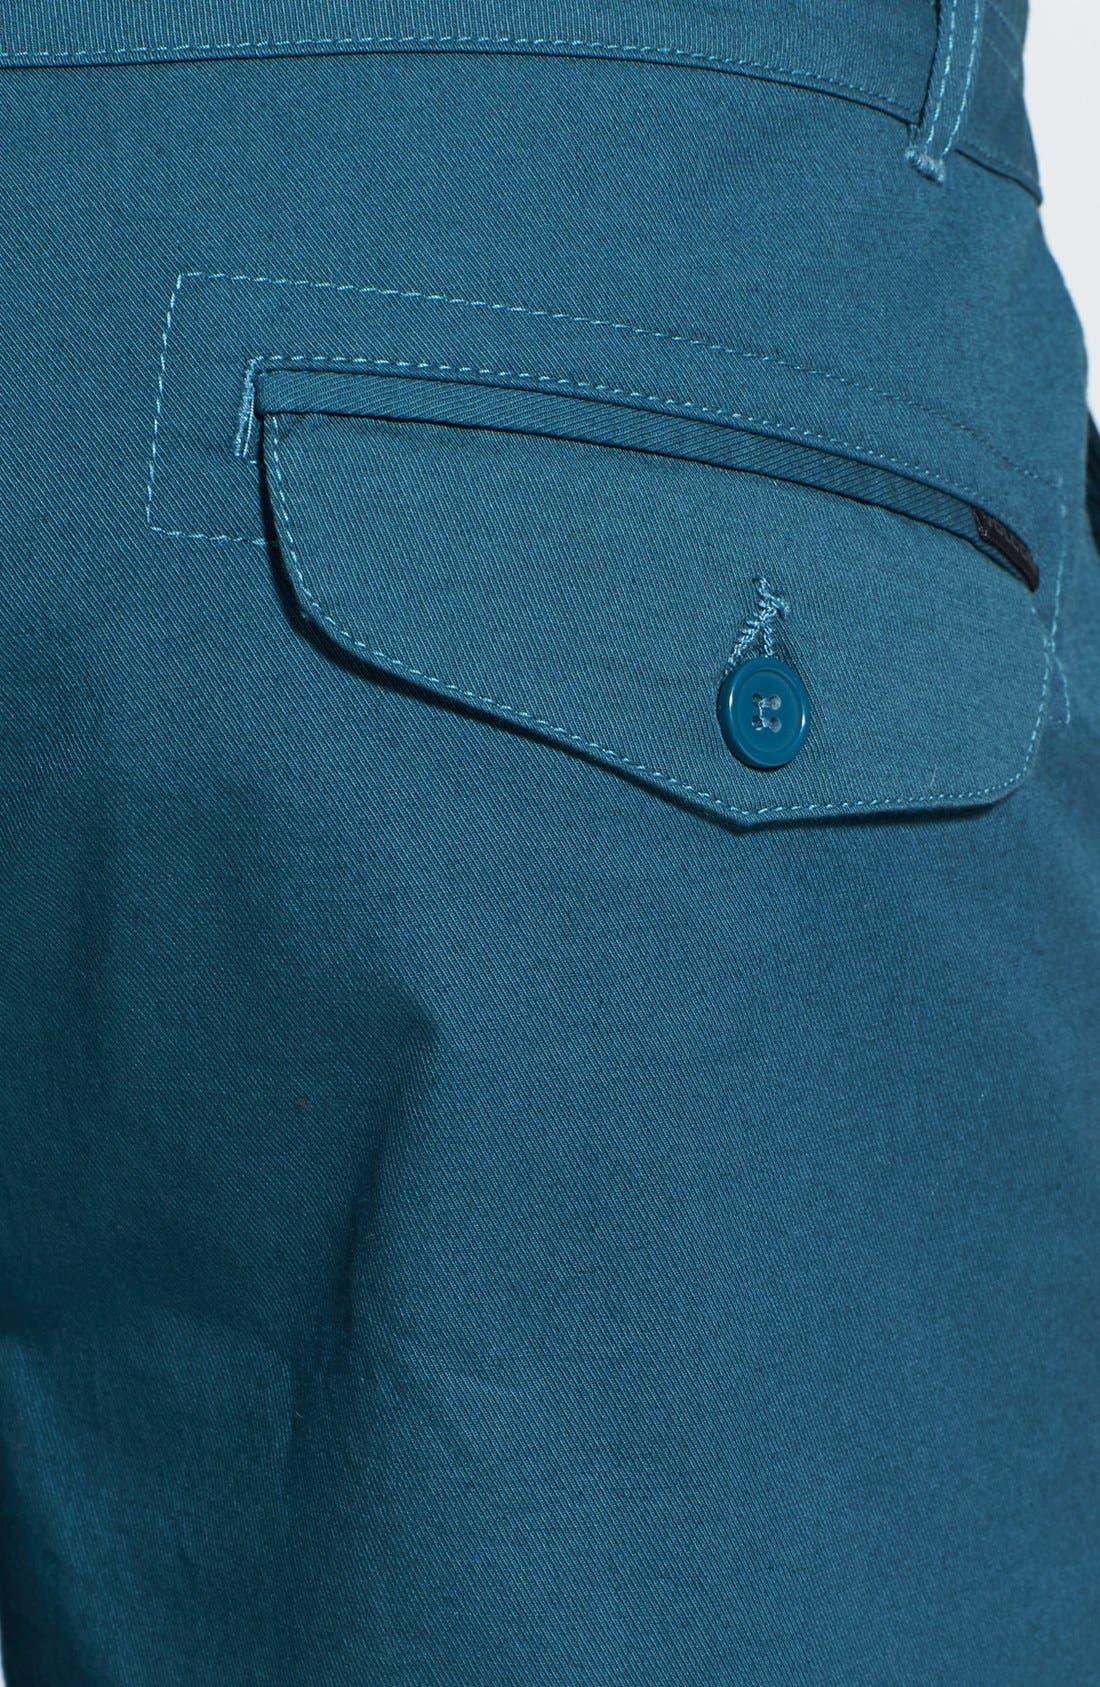 Alternate Image 3  - Volcom 'Stonewater' Shorts